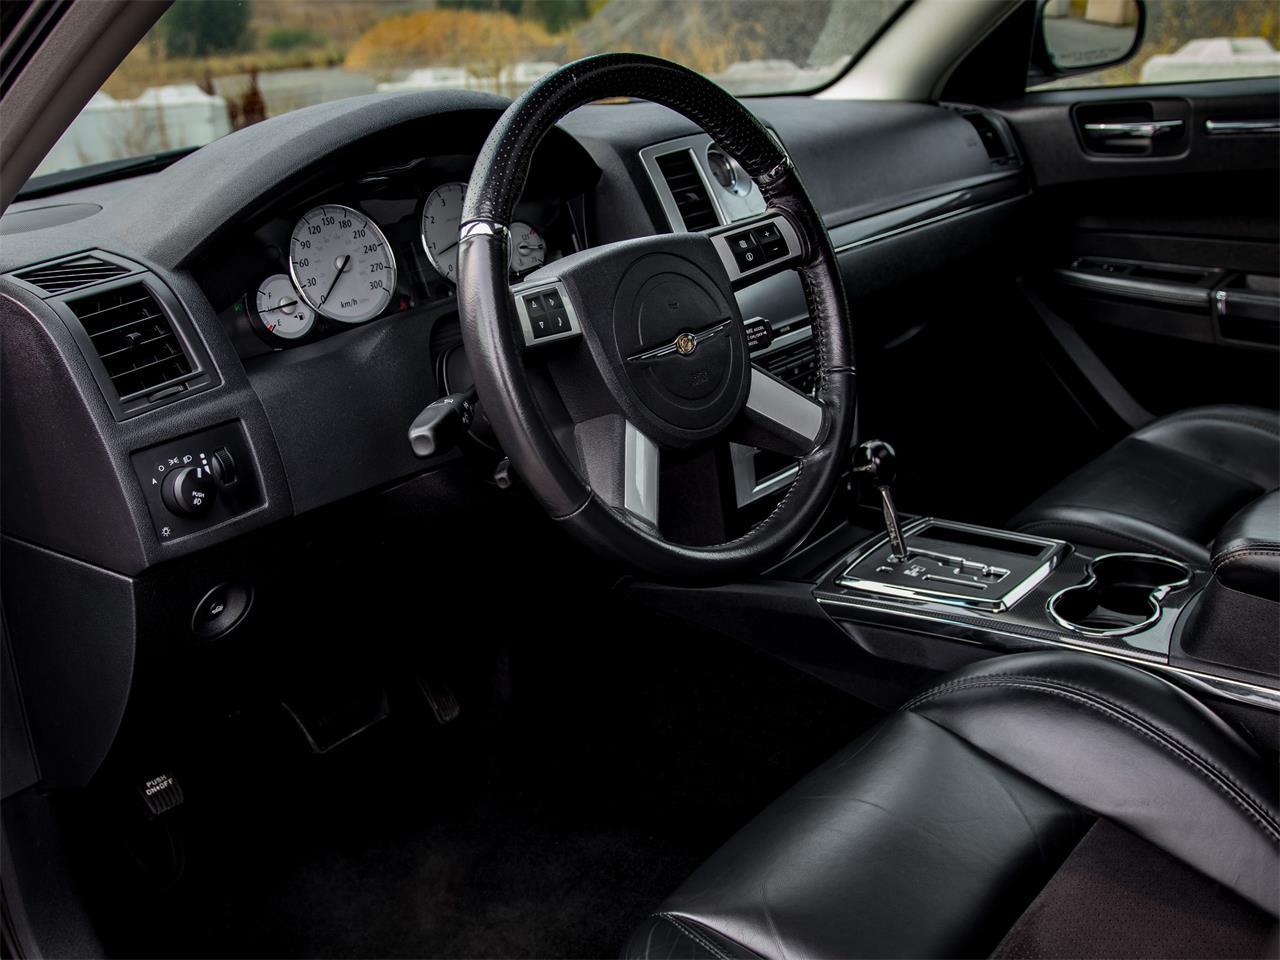 2008 Chrysler 300 (CC-1391930) for sale in Kelowna, British Columbia